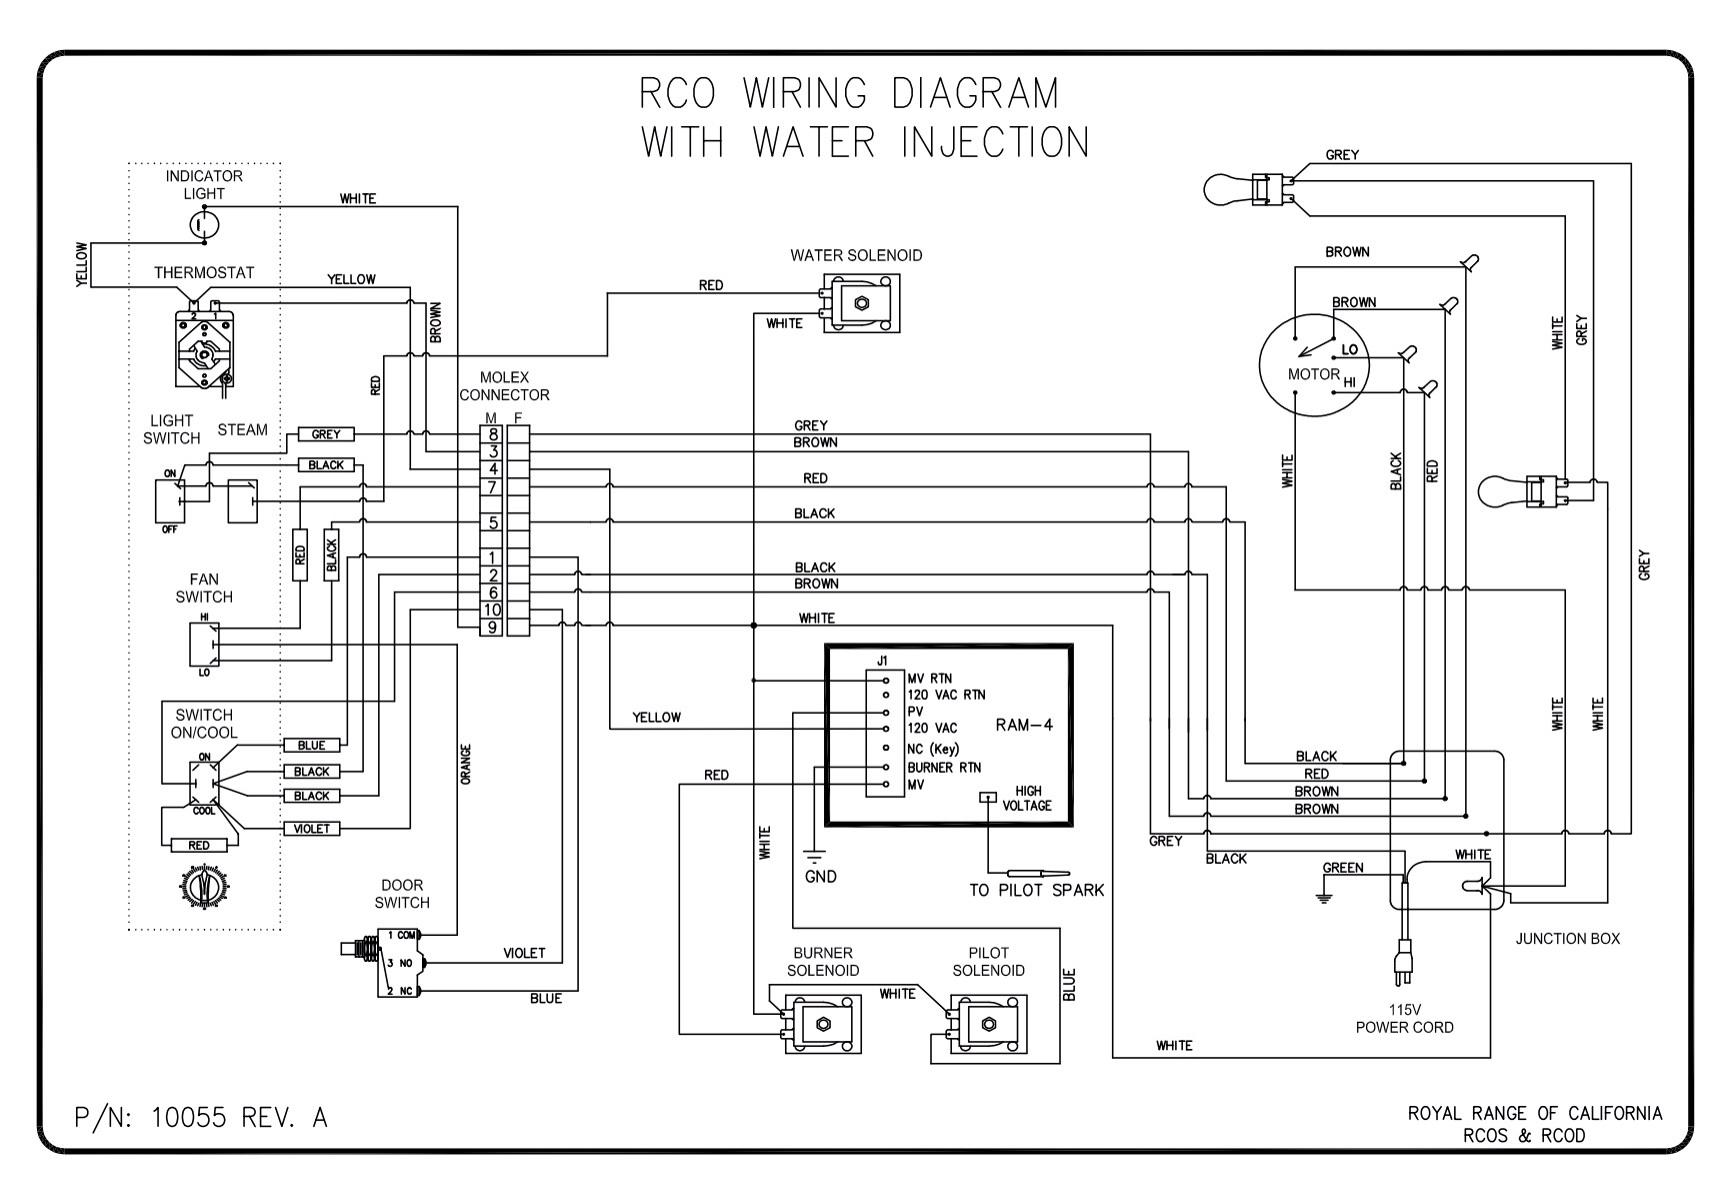 Boss Fs 6 Circuit Diagram Custom Project Wiring 1981 280zx Ecu Cto 560 Black And Decker Countertop Oven